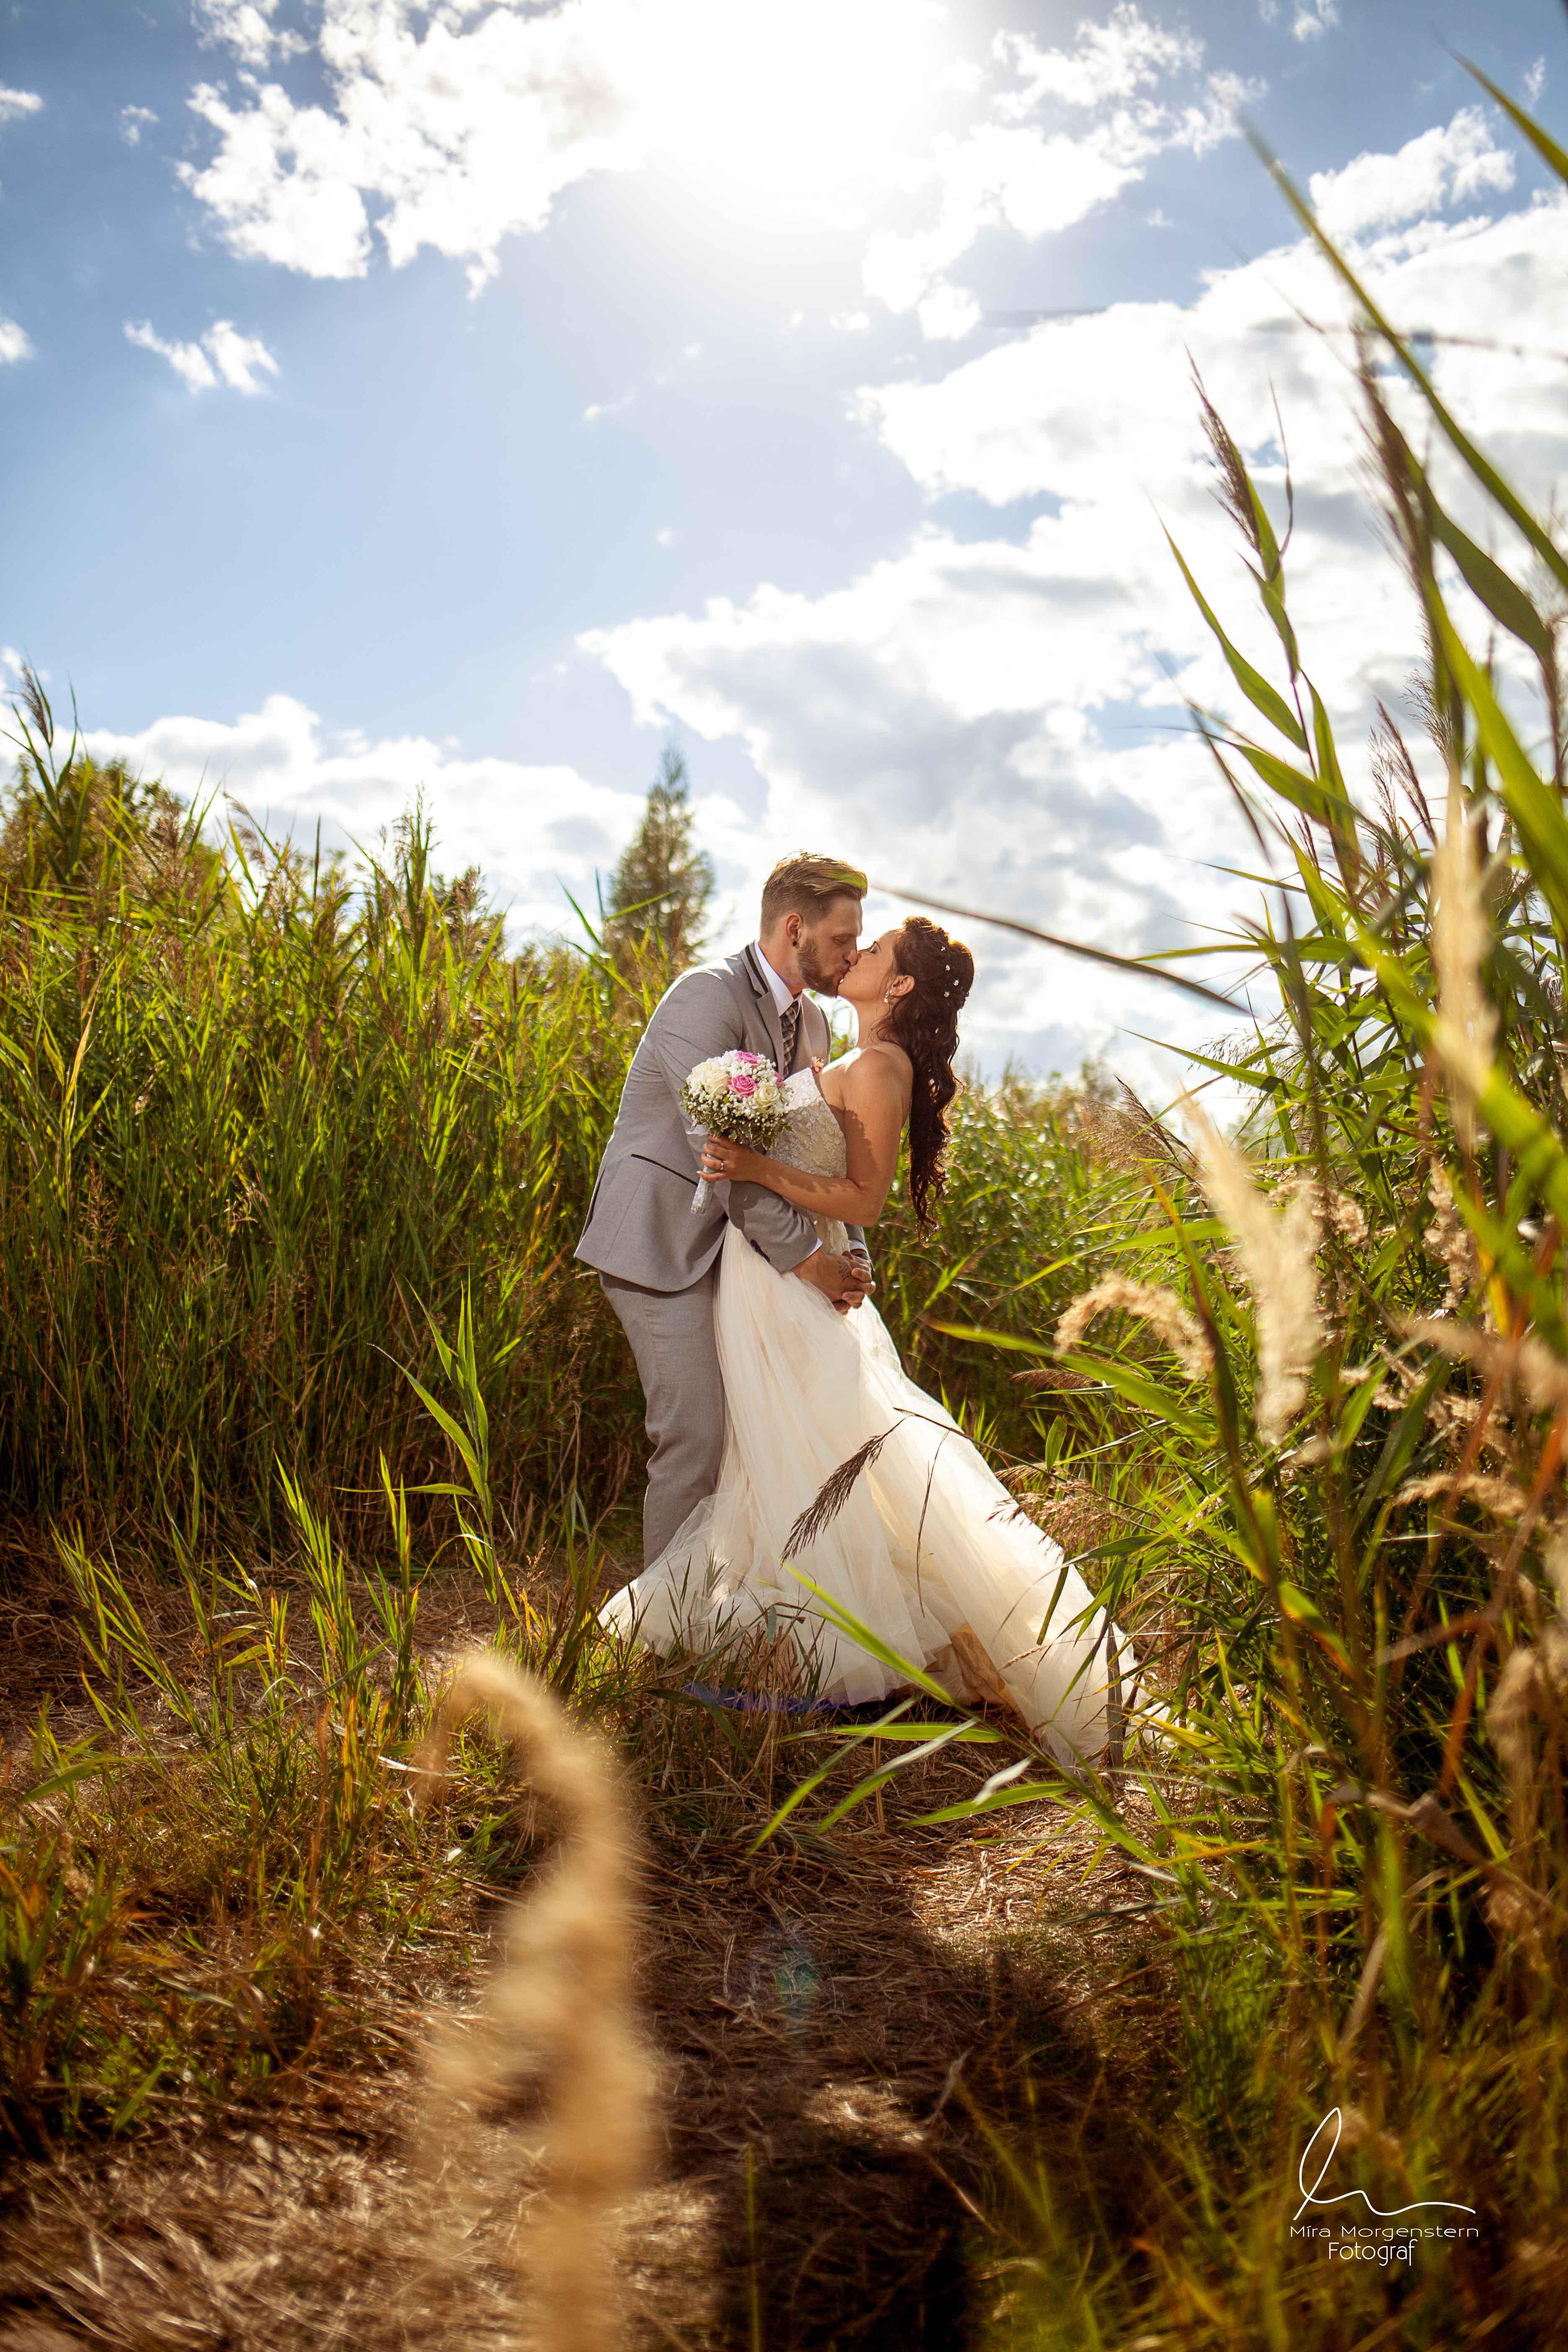 svatební fotograf , svatební fotograf praha, fotograf na svatbu , fotograf